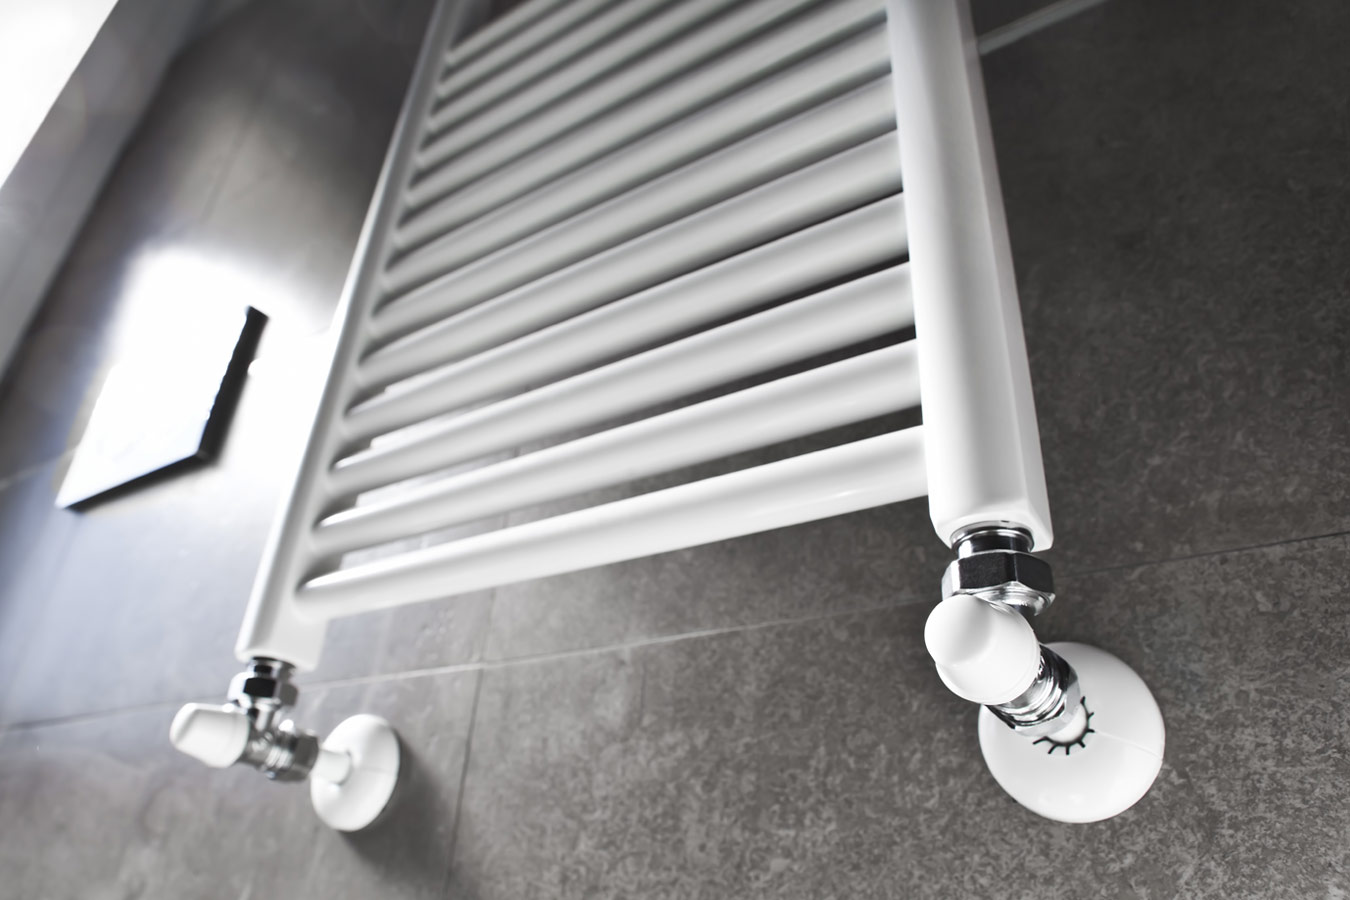 Verwarming kiezen advies info - Radiator badezimmer ...